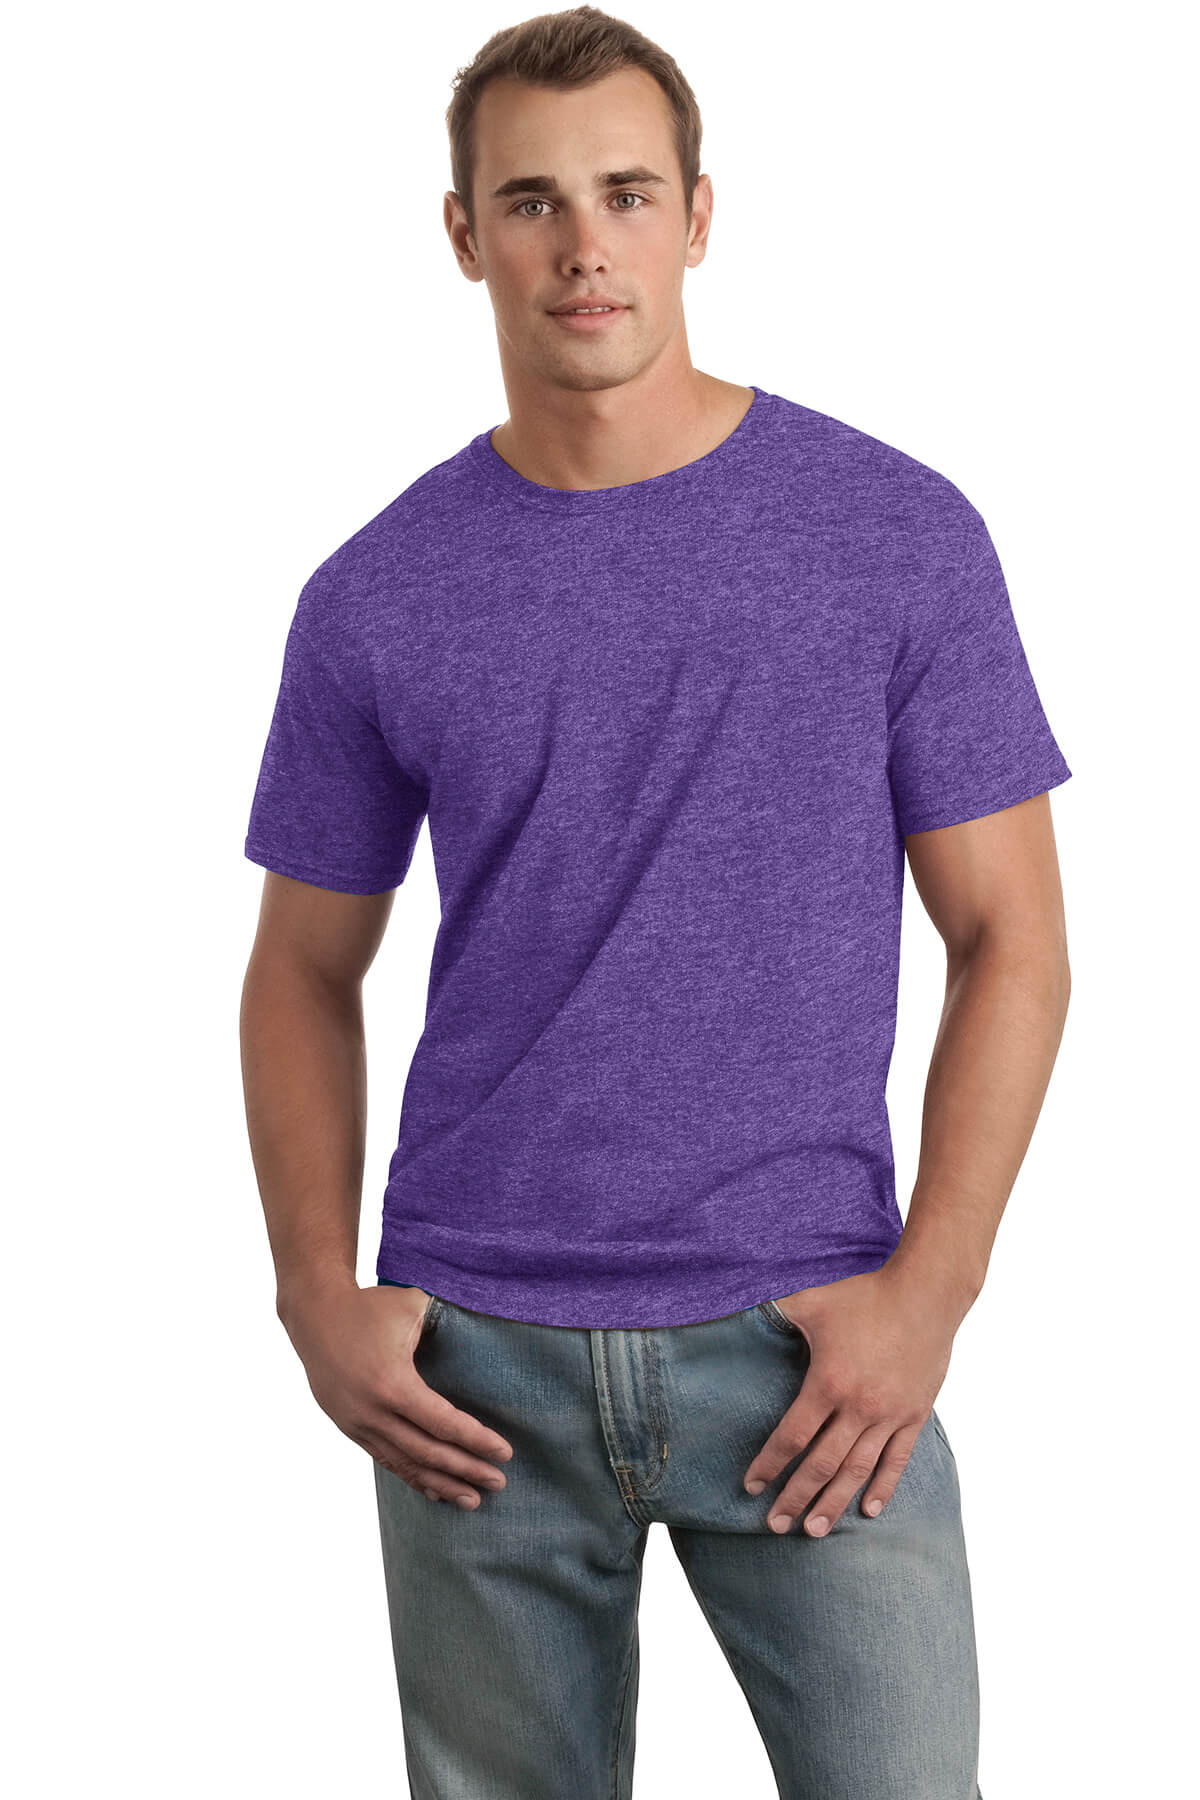 Heather Purple T-Shirt Model Front